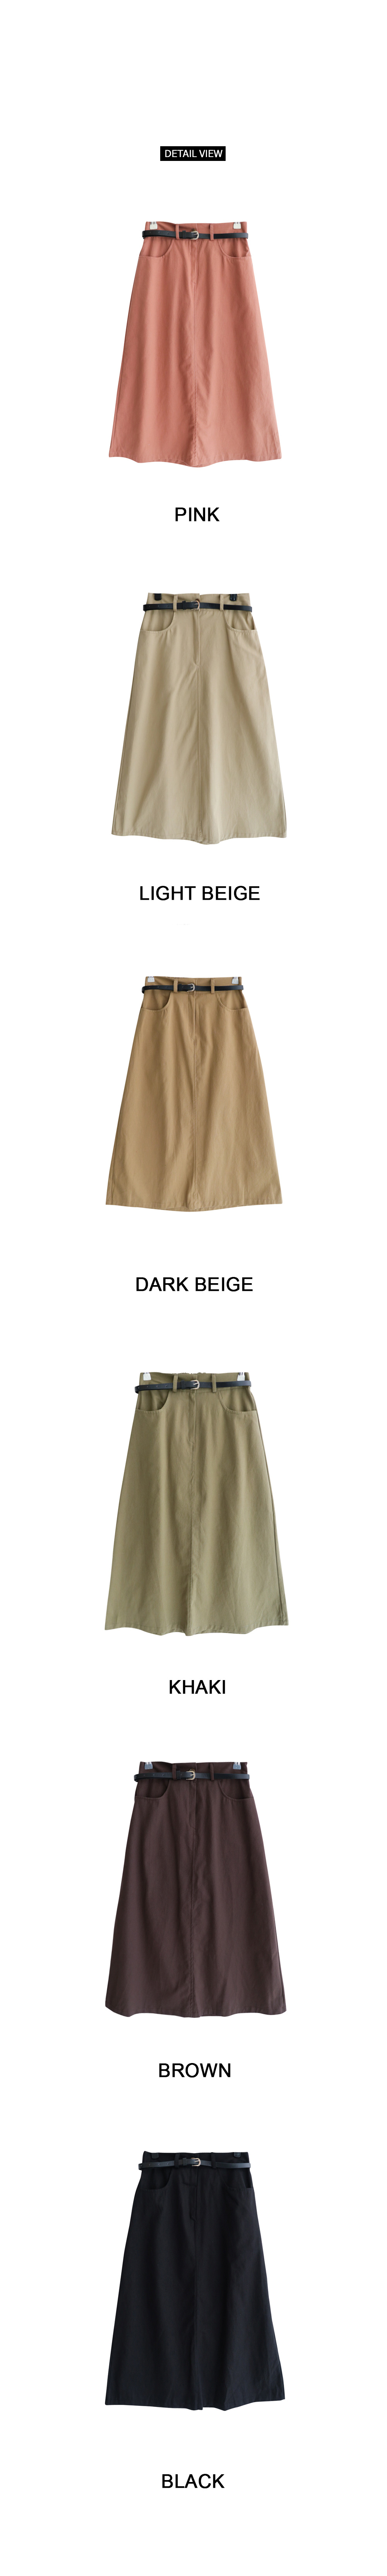 Crong cotton long skirt